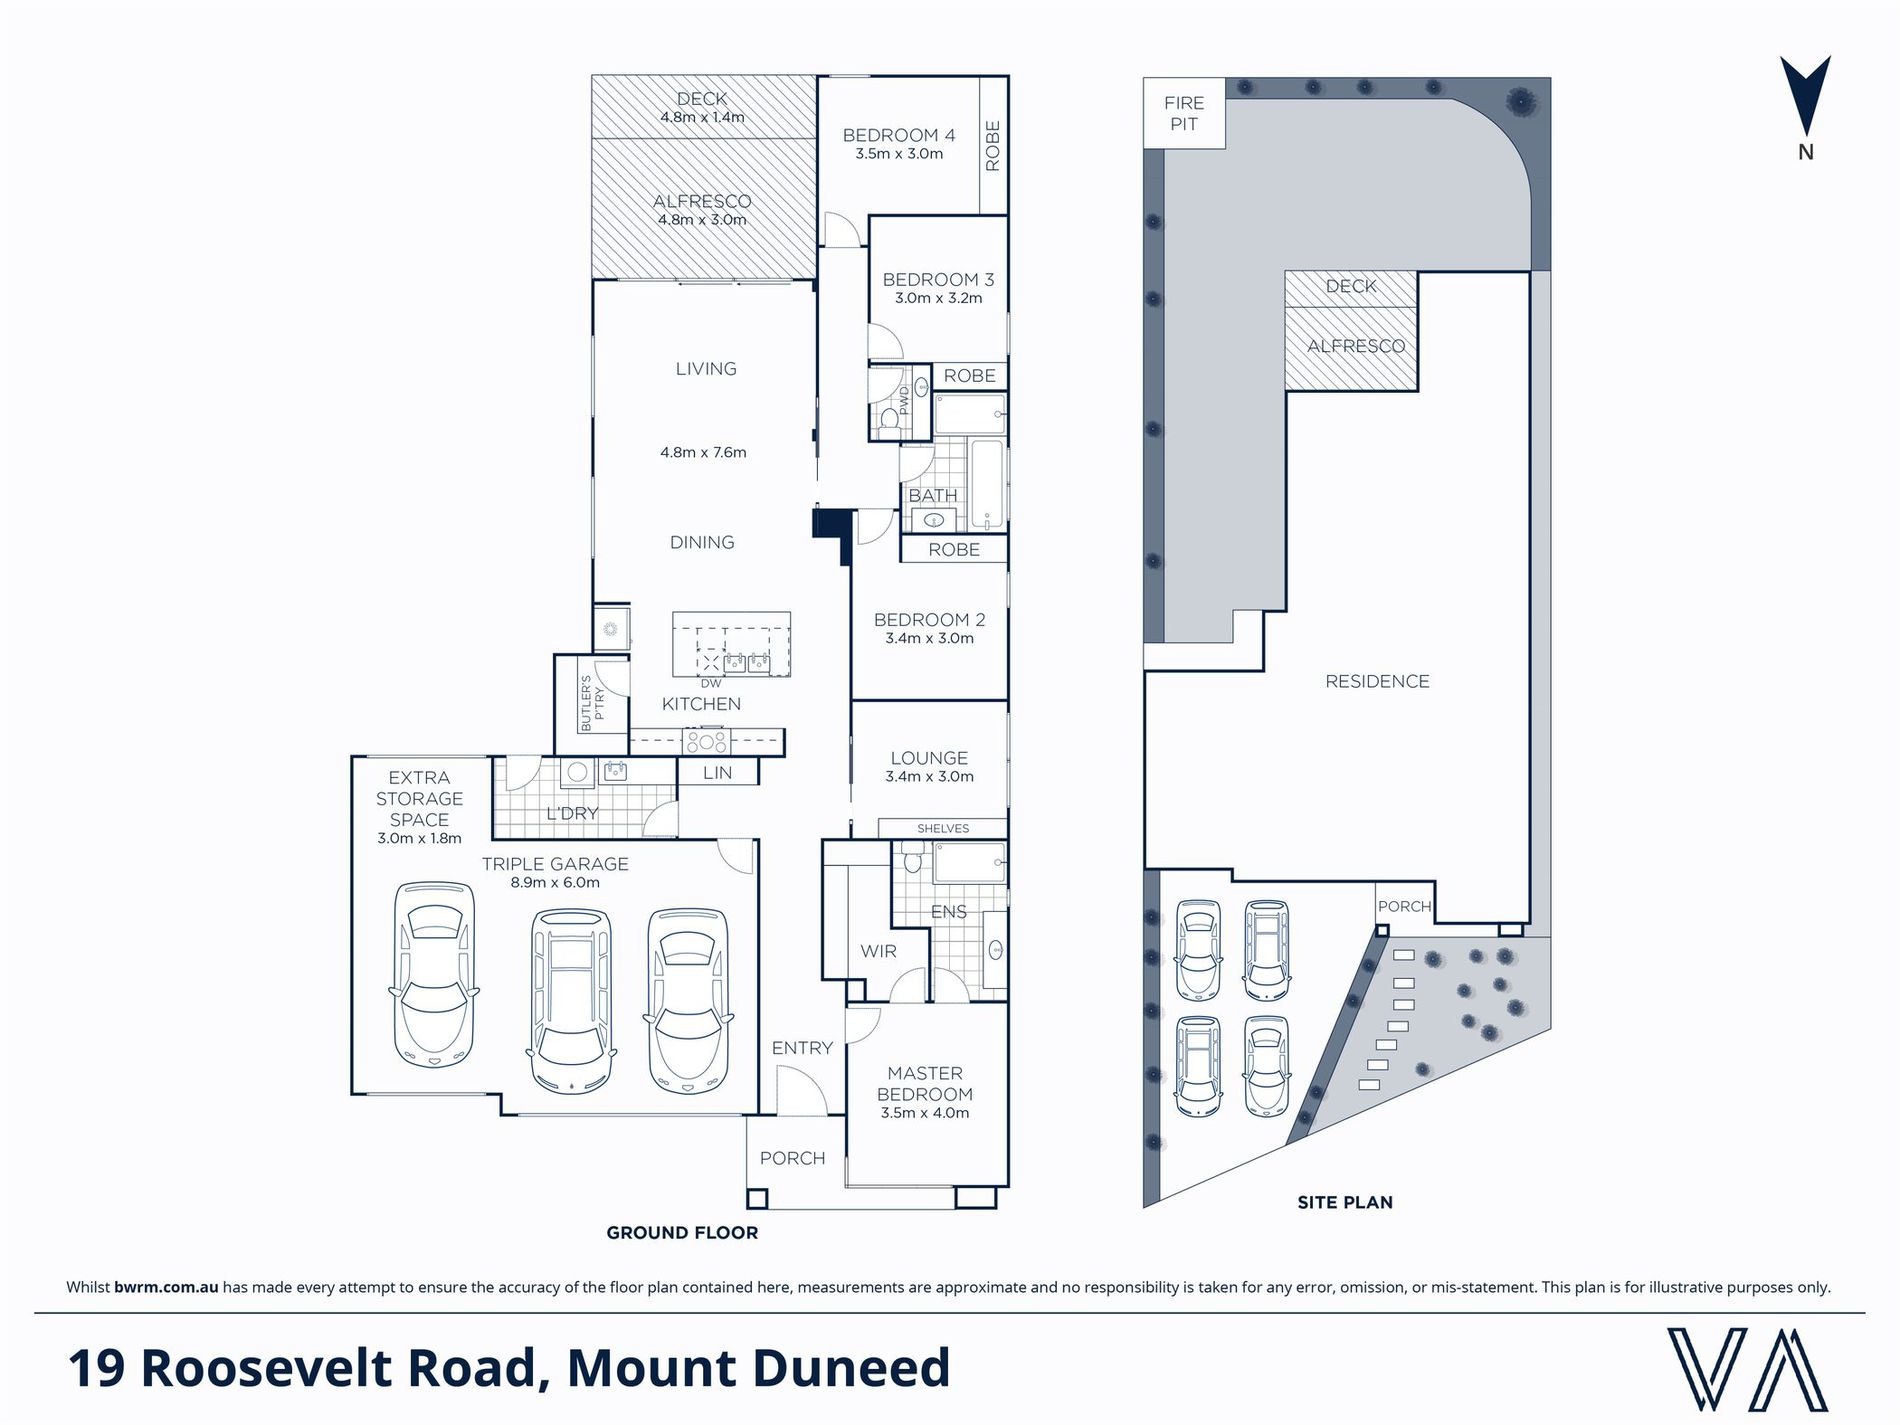 19 Roosevelt Road, Mount Duneed